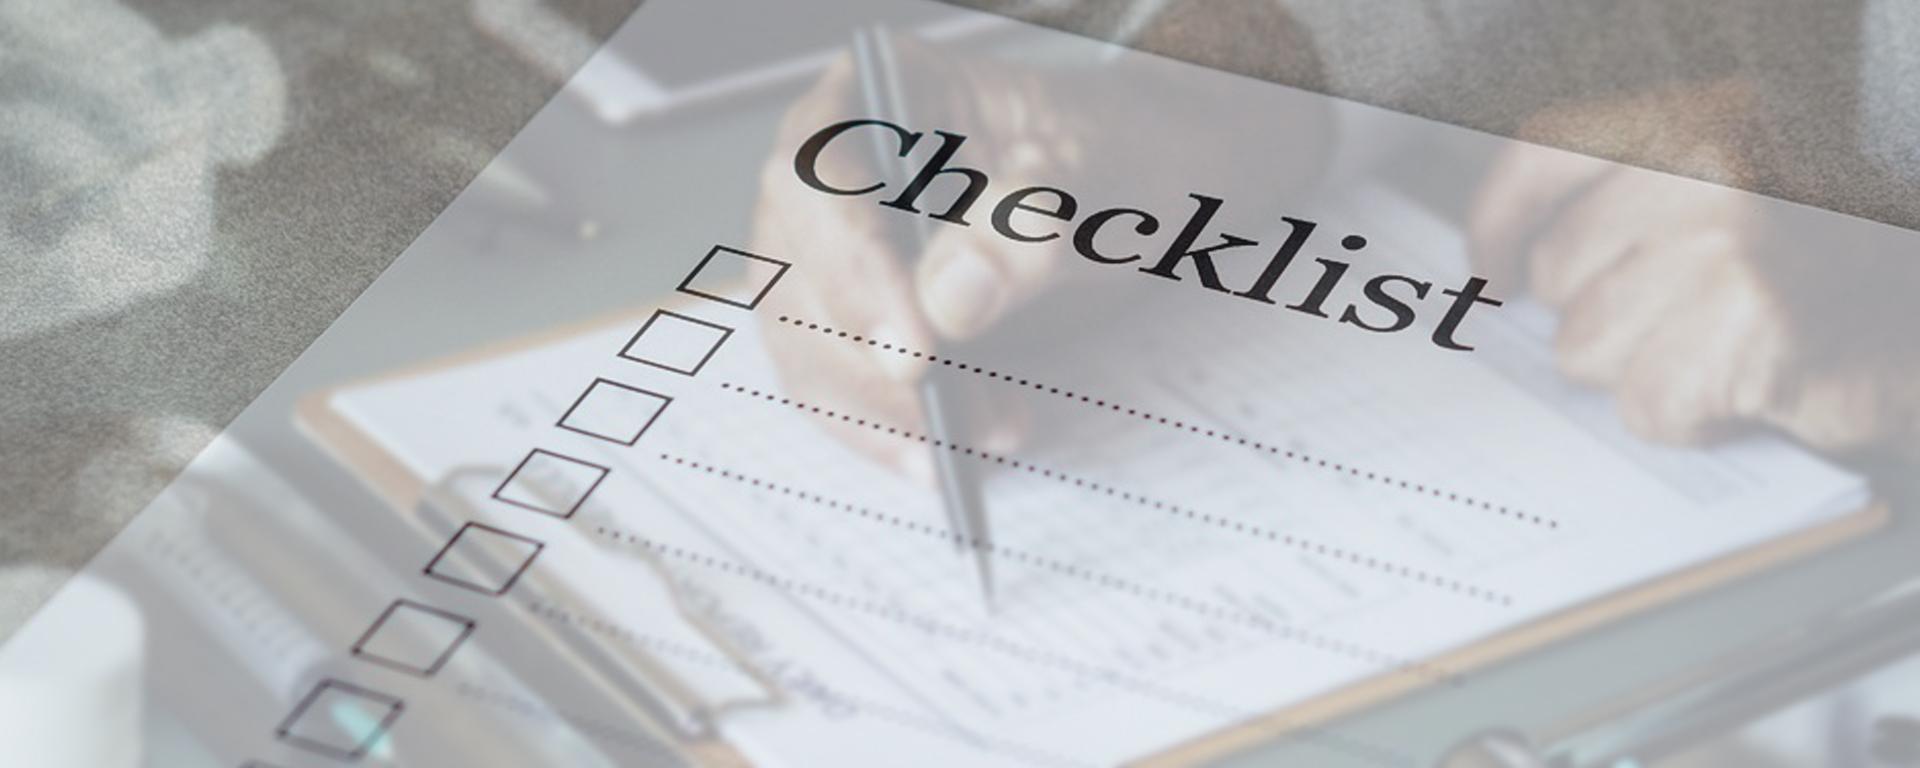 Man reviewing a checklist